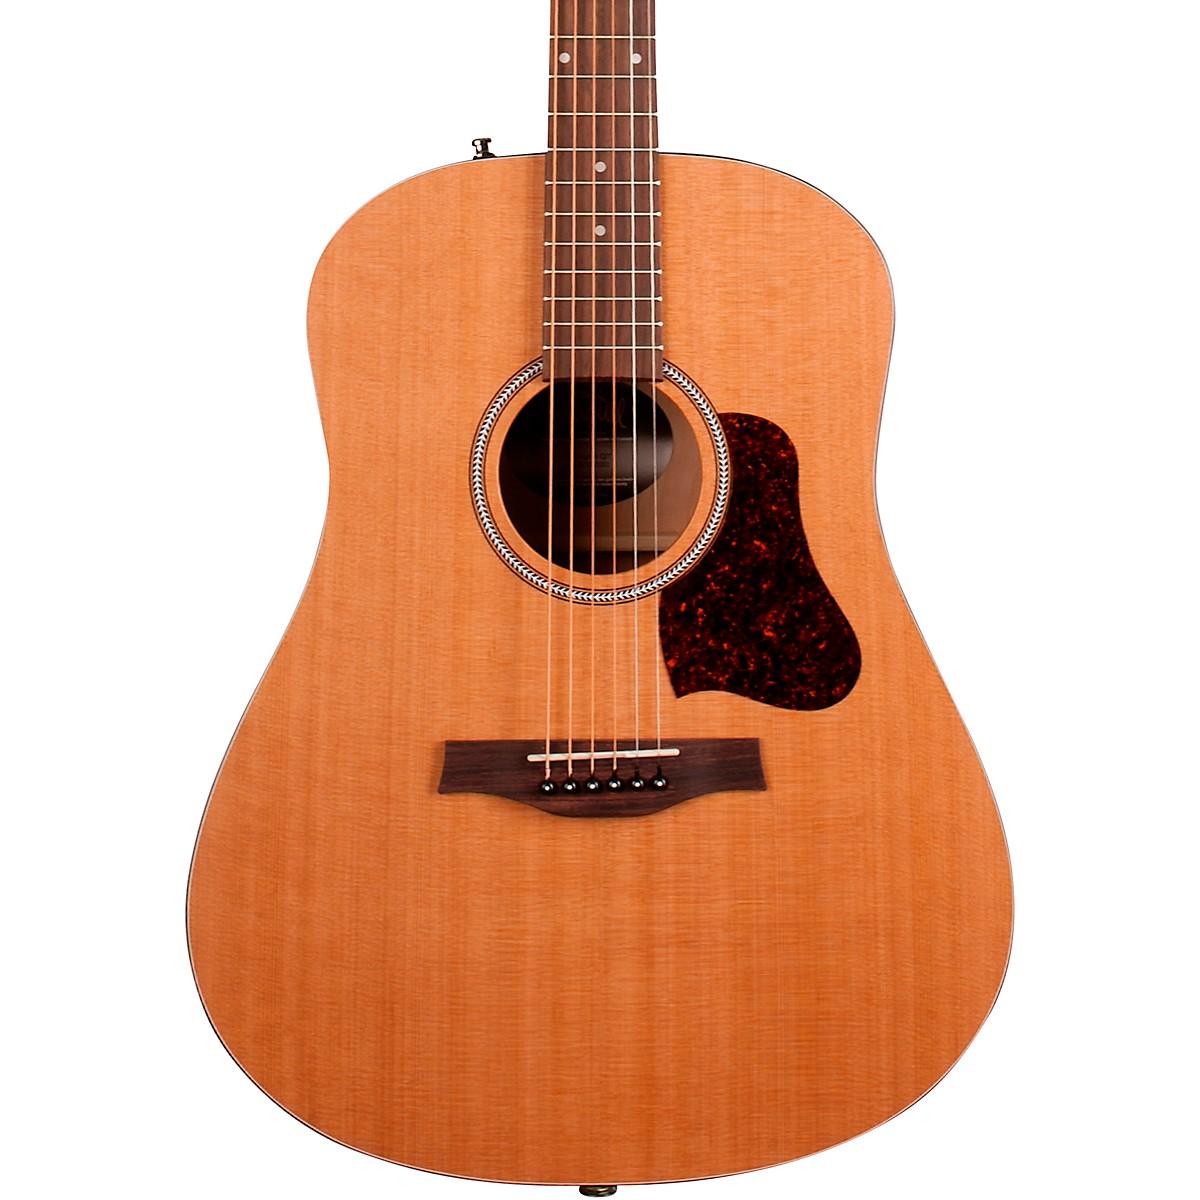 Seagull Seagull S6 Original QIT Dreadnought Acoustic-Electric Guitar